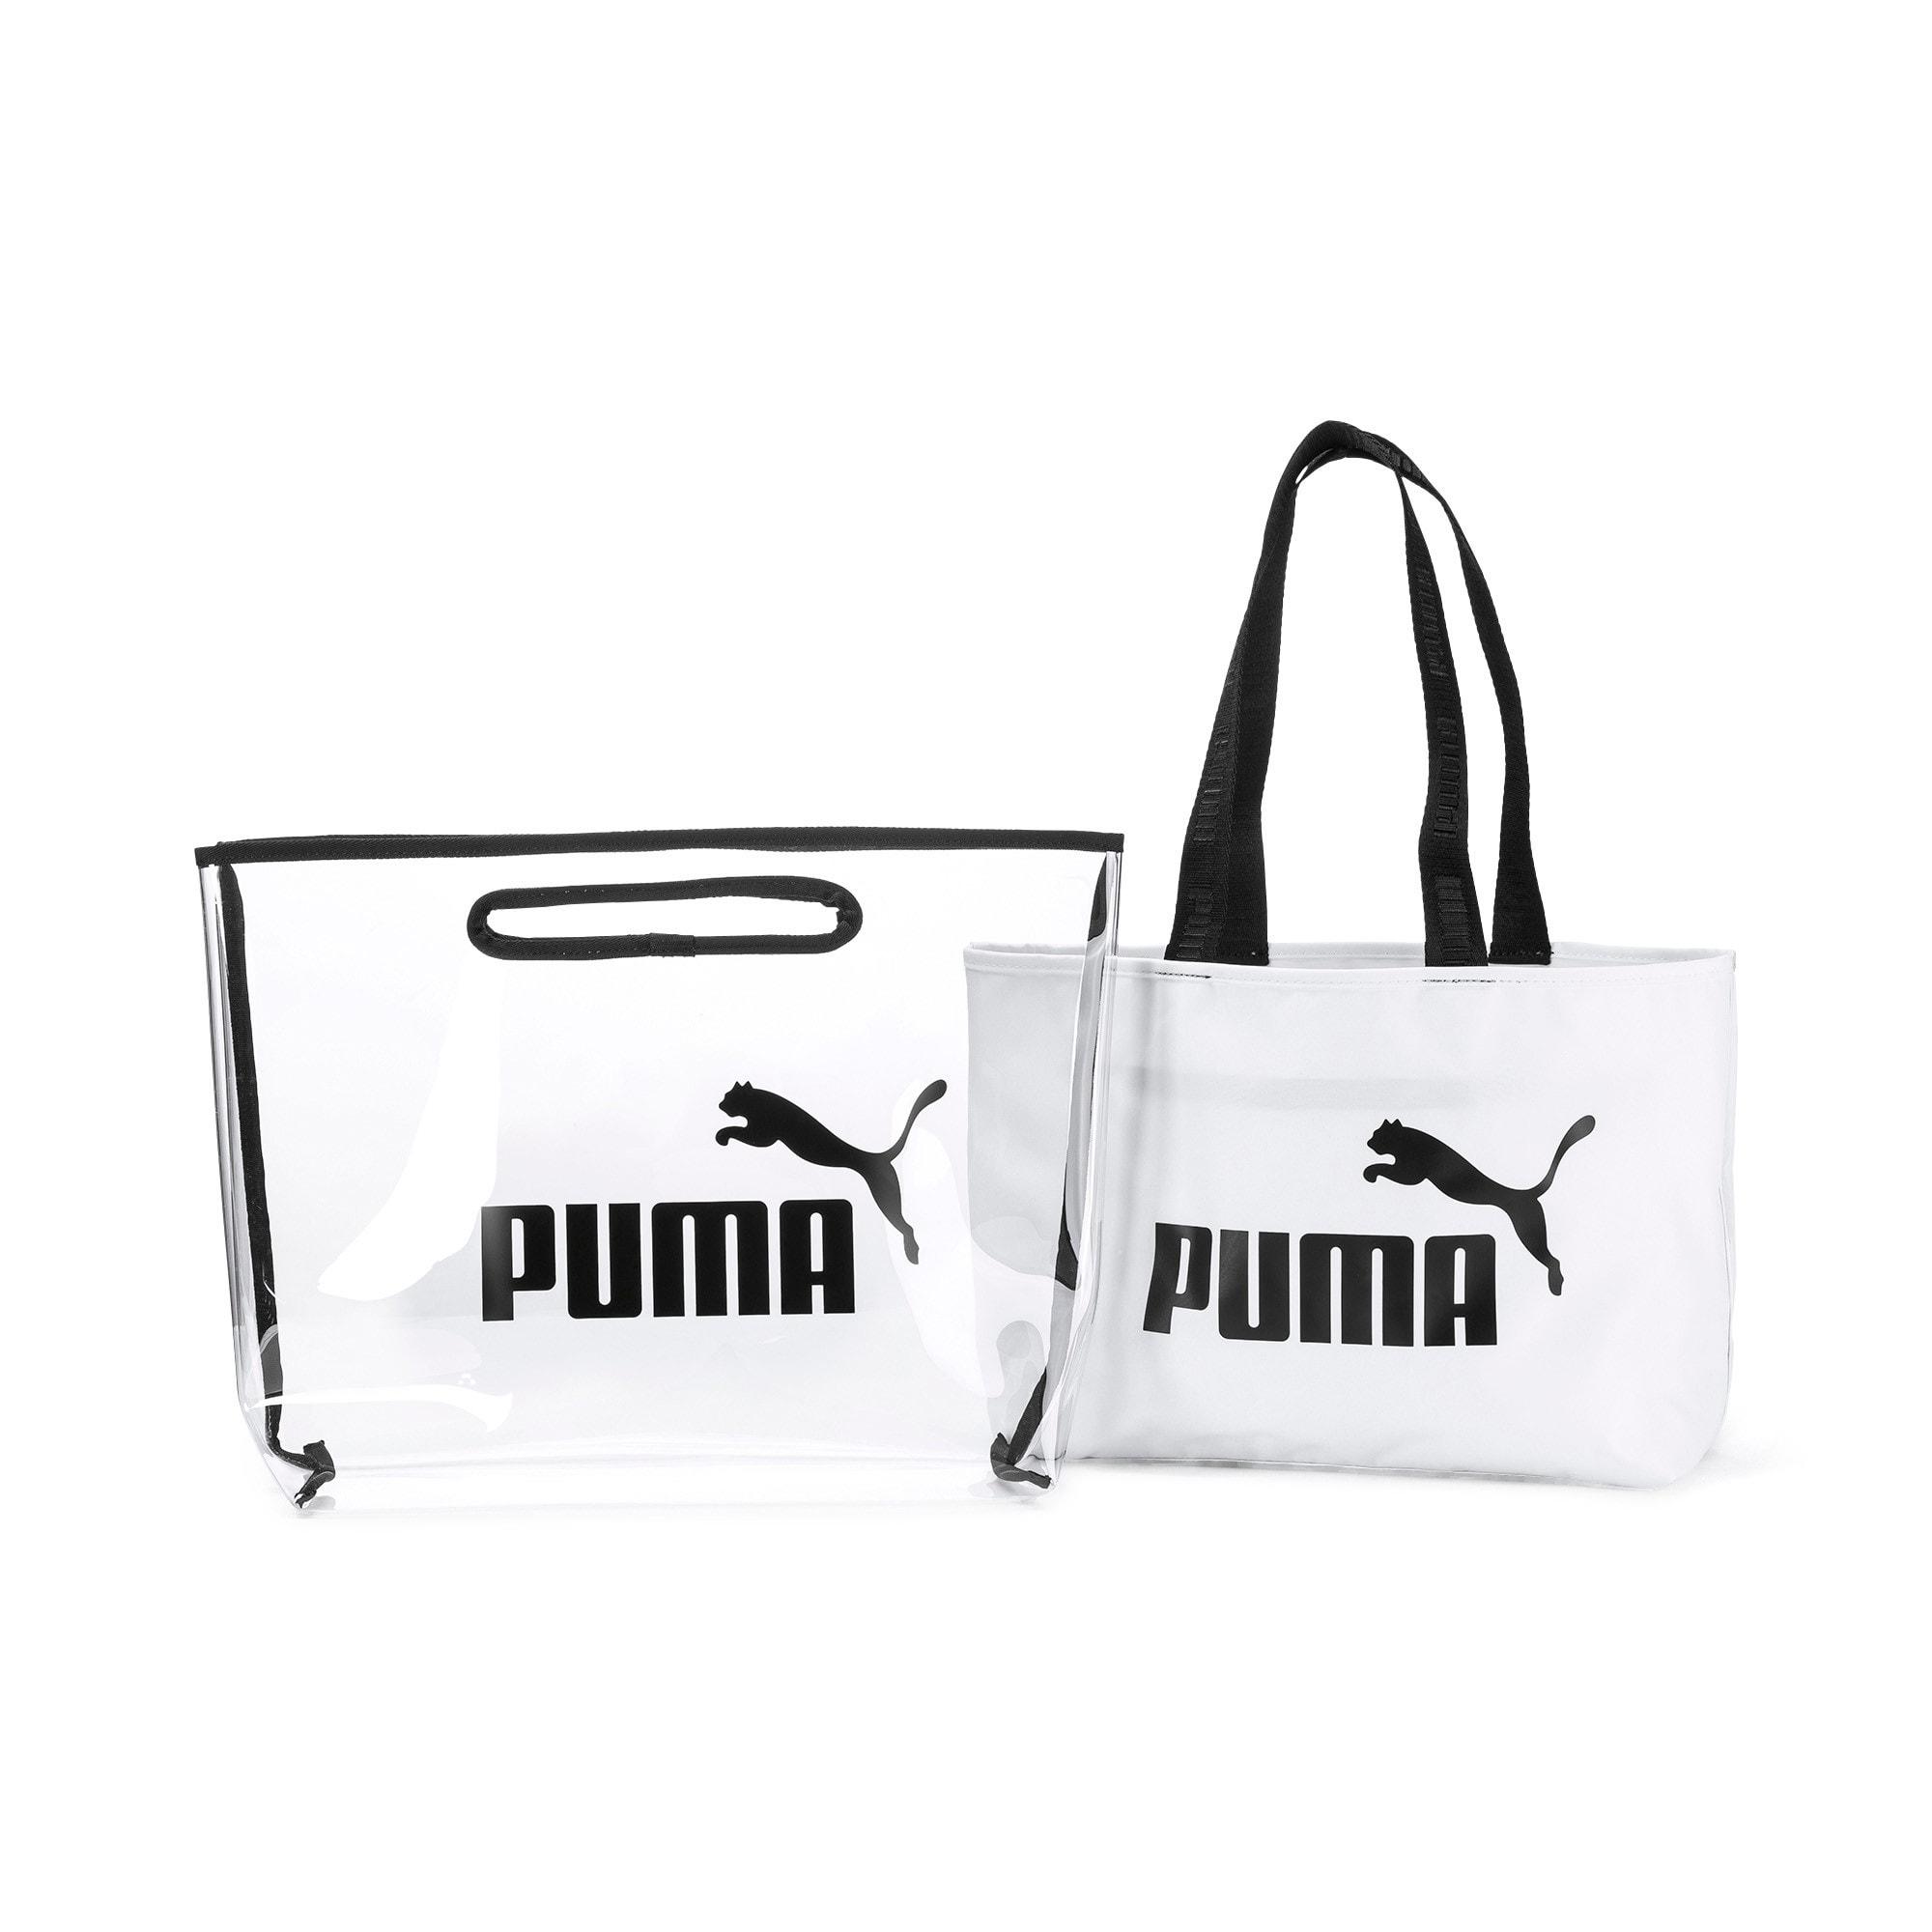 Thumbnail 3 of Women's Twin Shopper, Puma White, medium